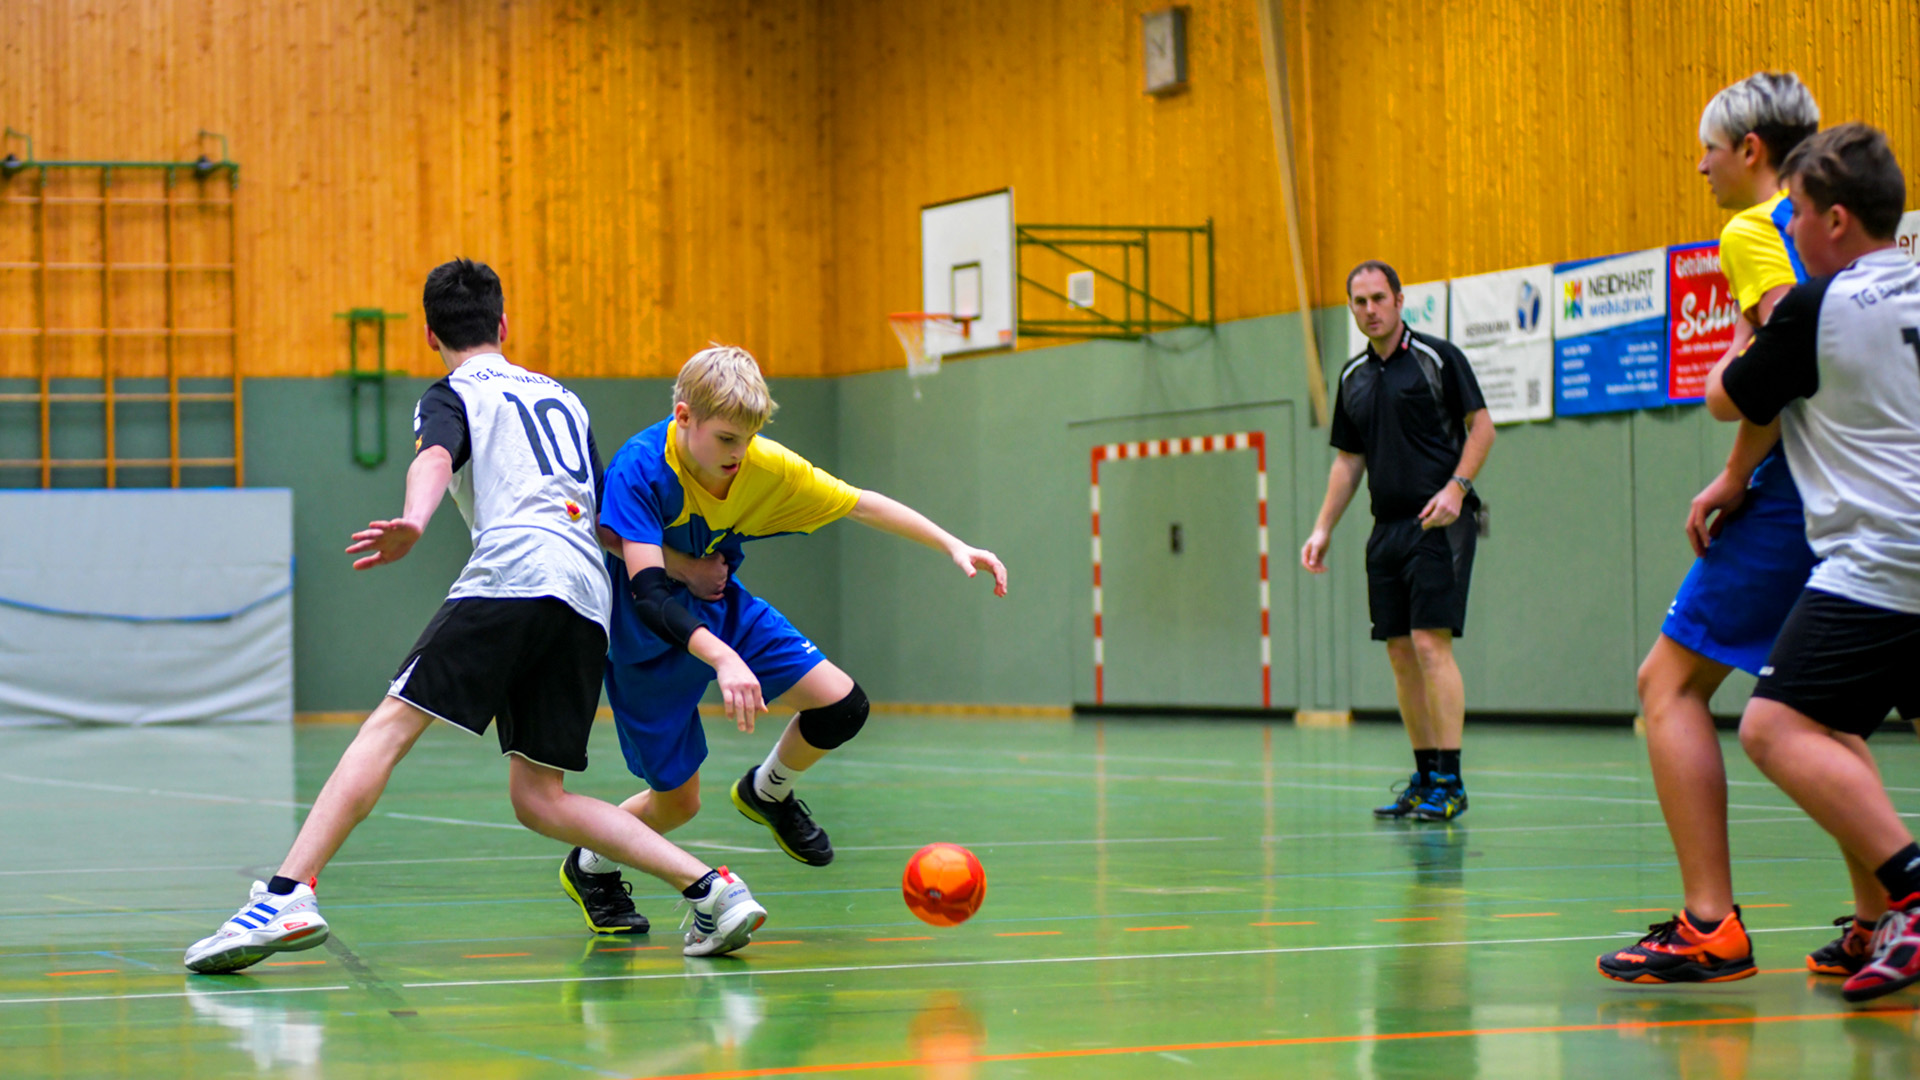 098Slider_mC_tsg_leutkirch_handball